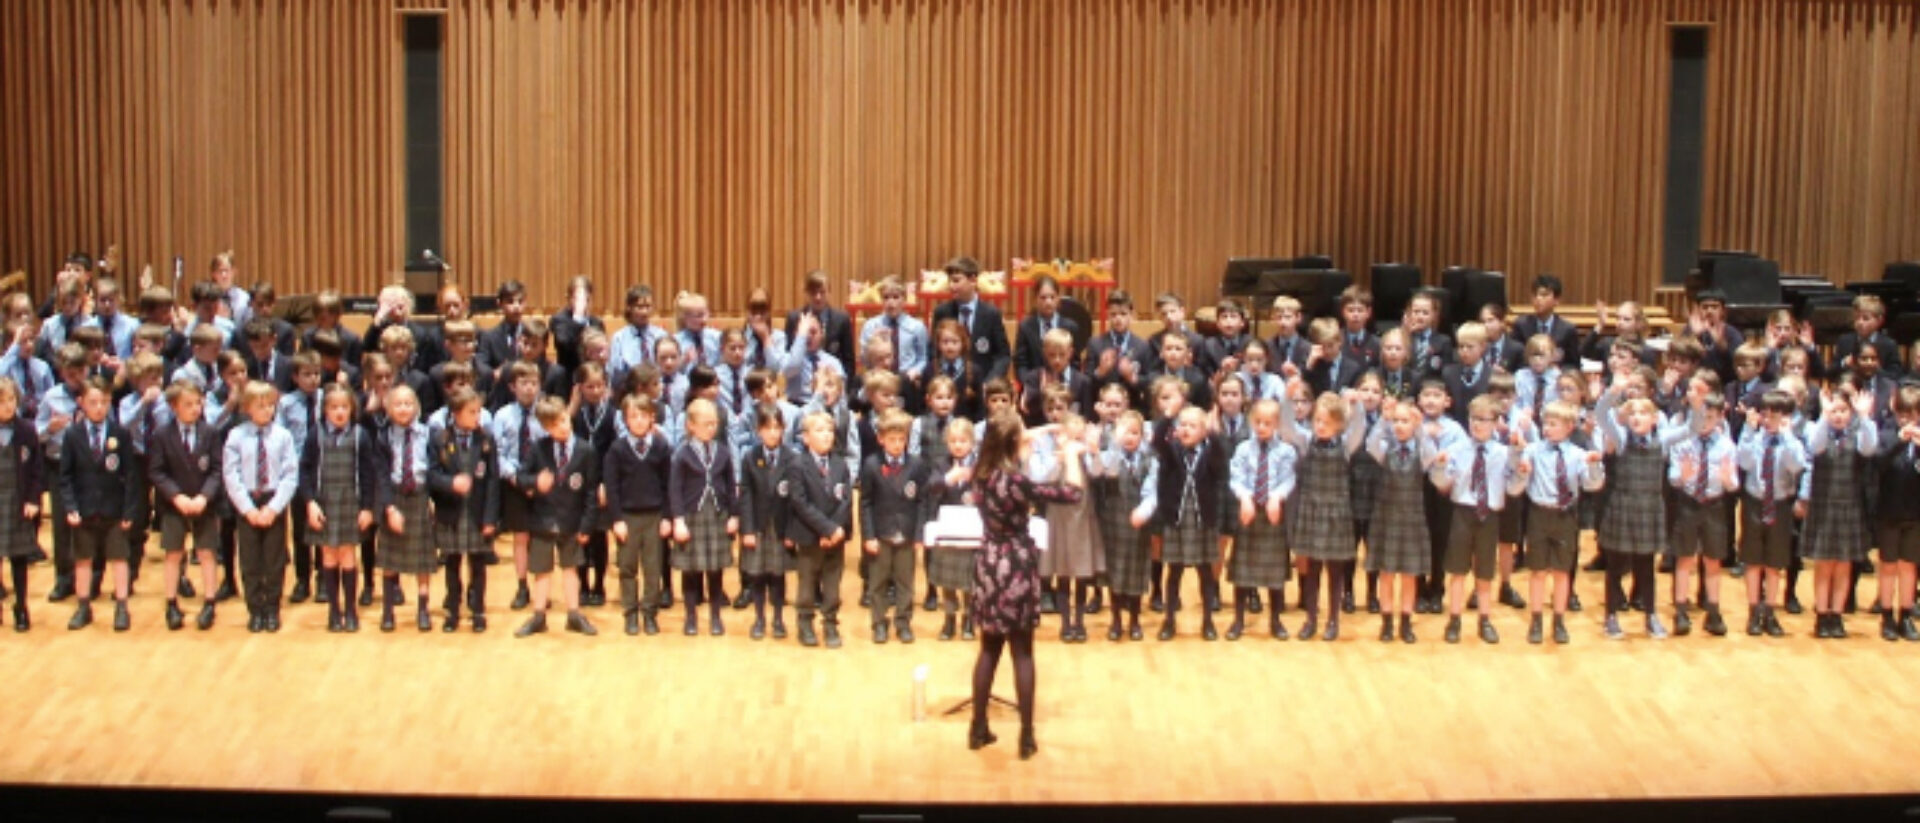 School children performing on stage